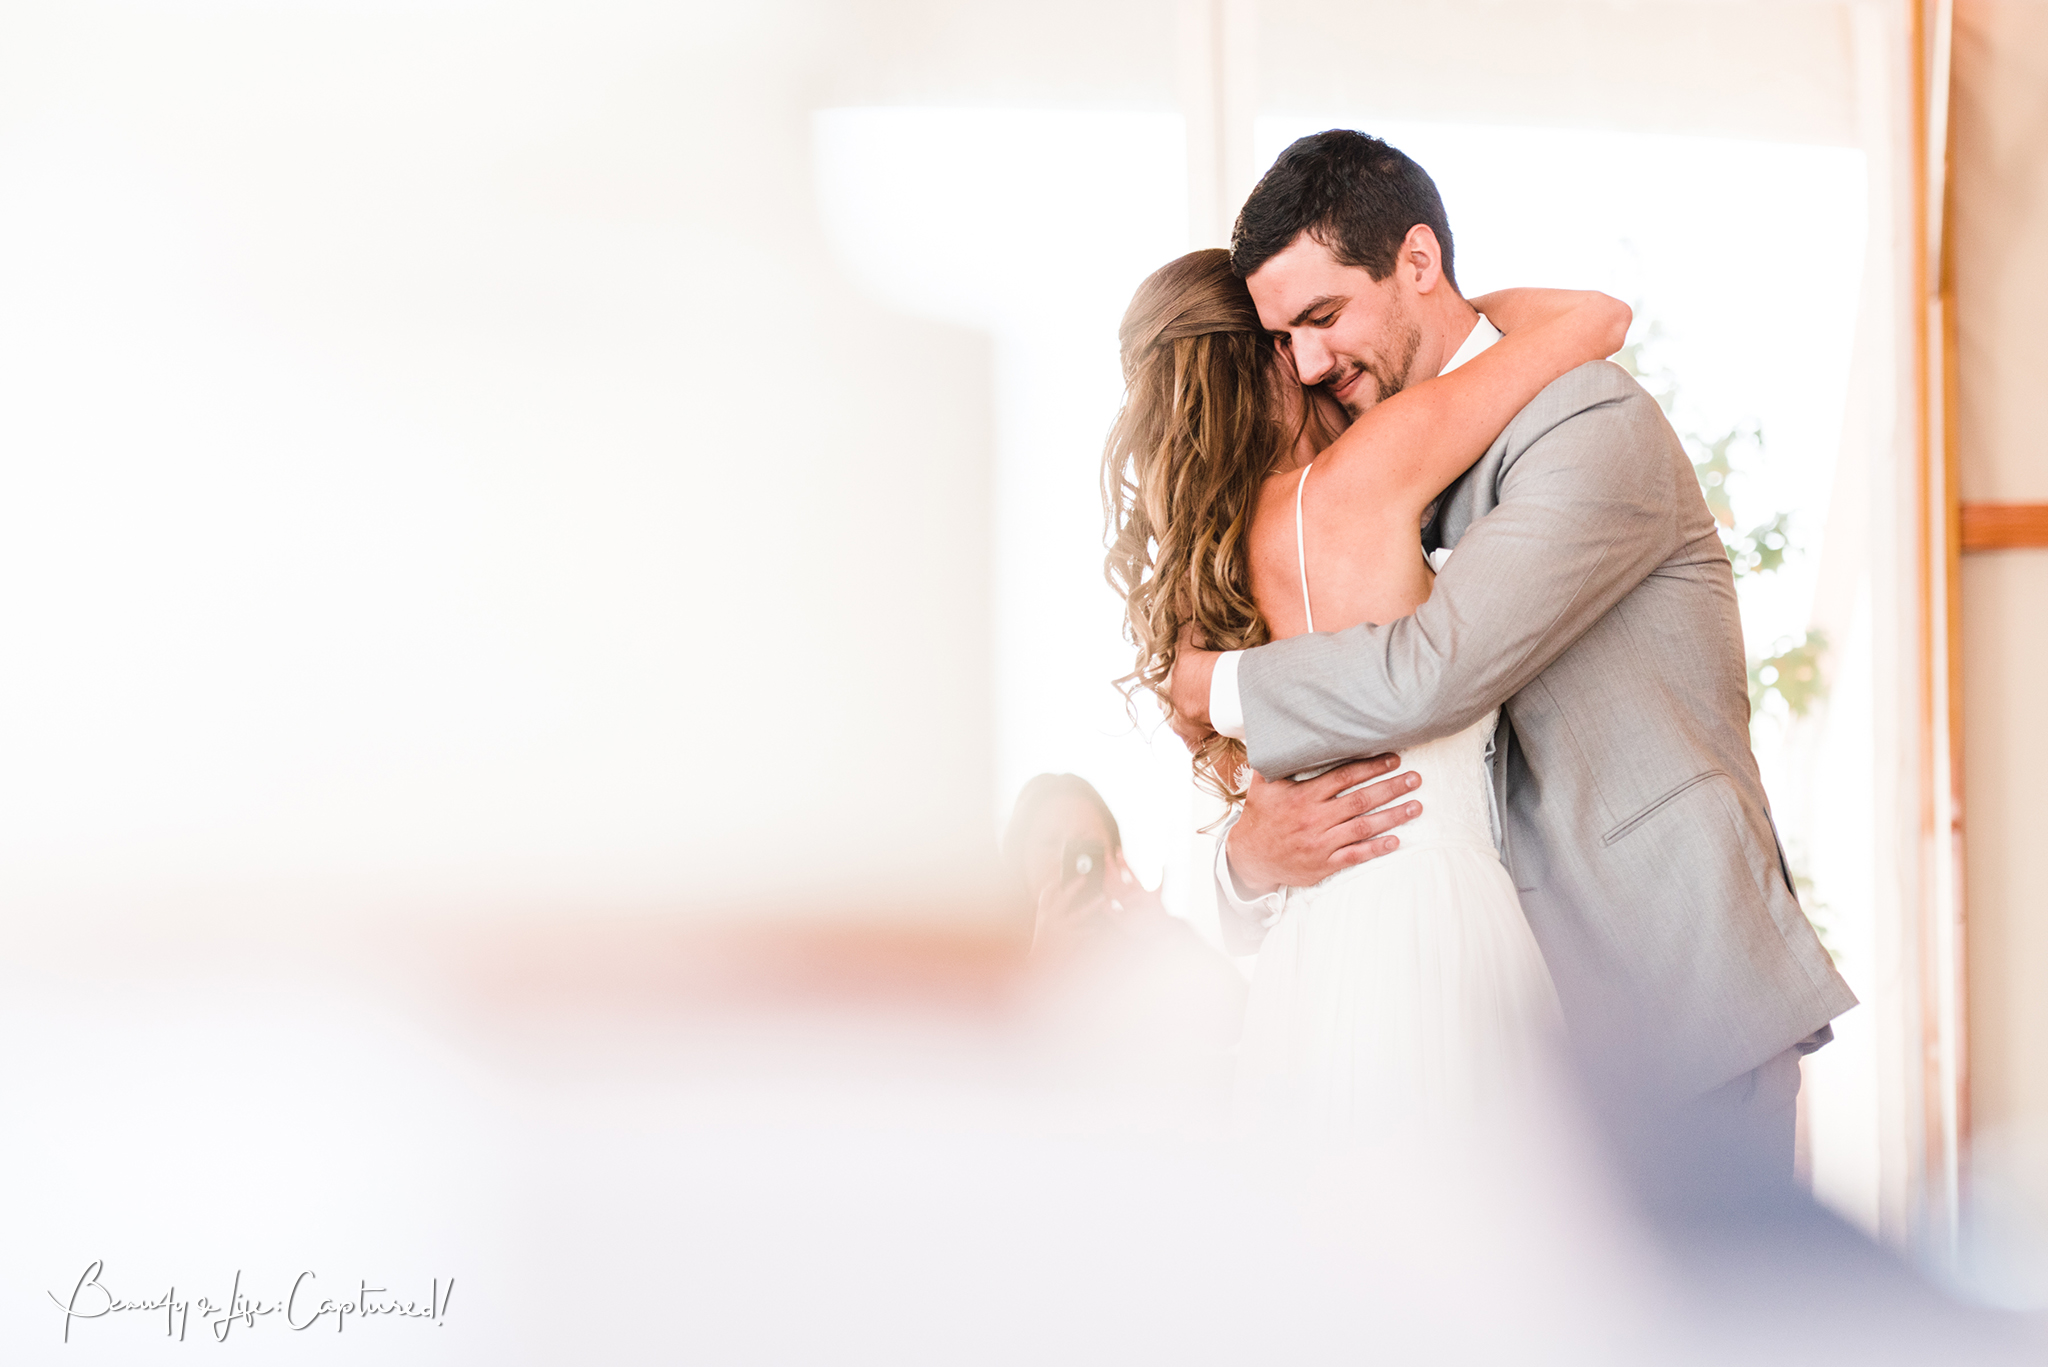 Beauty_and_Life_Captured_Athena_Wedding-17.jpg